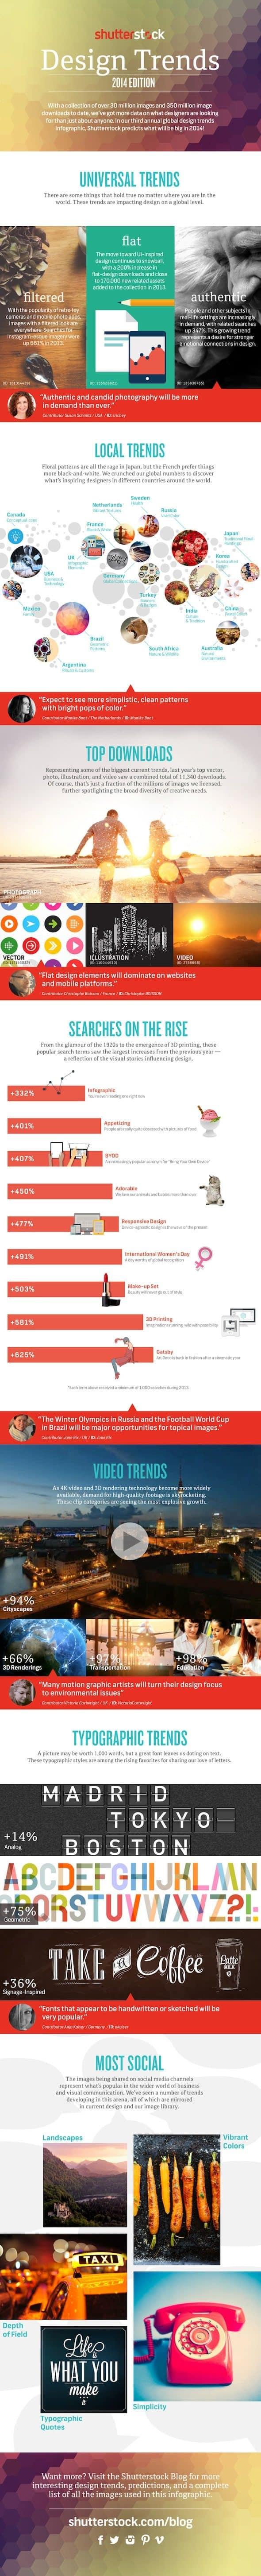 Shutterstock Infographic 2014